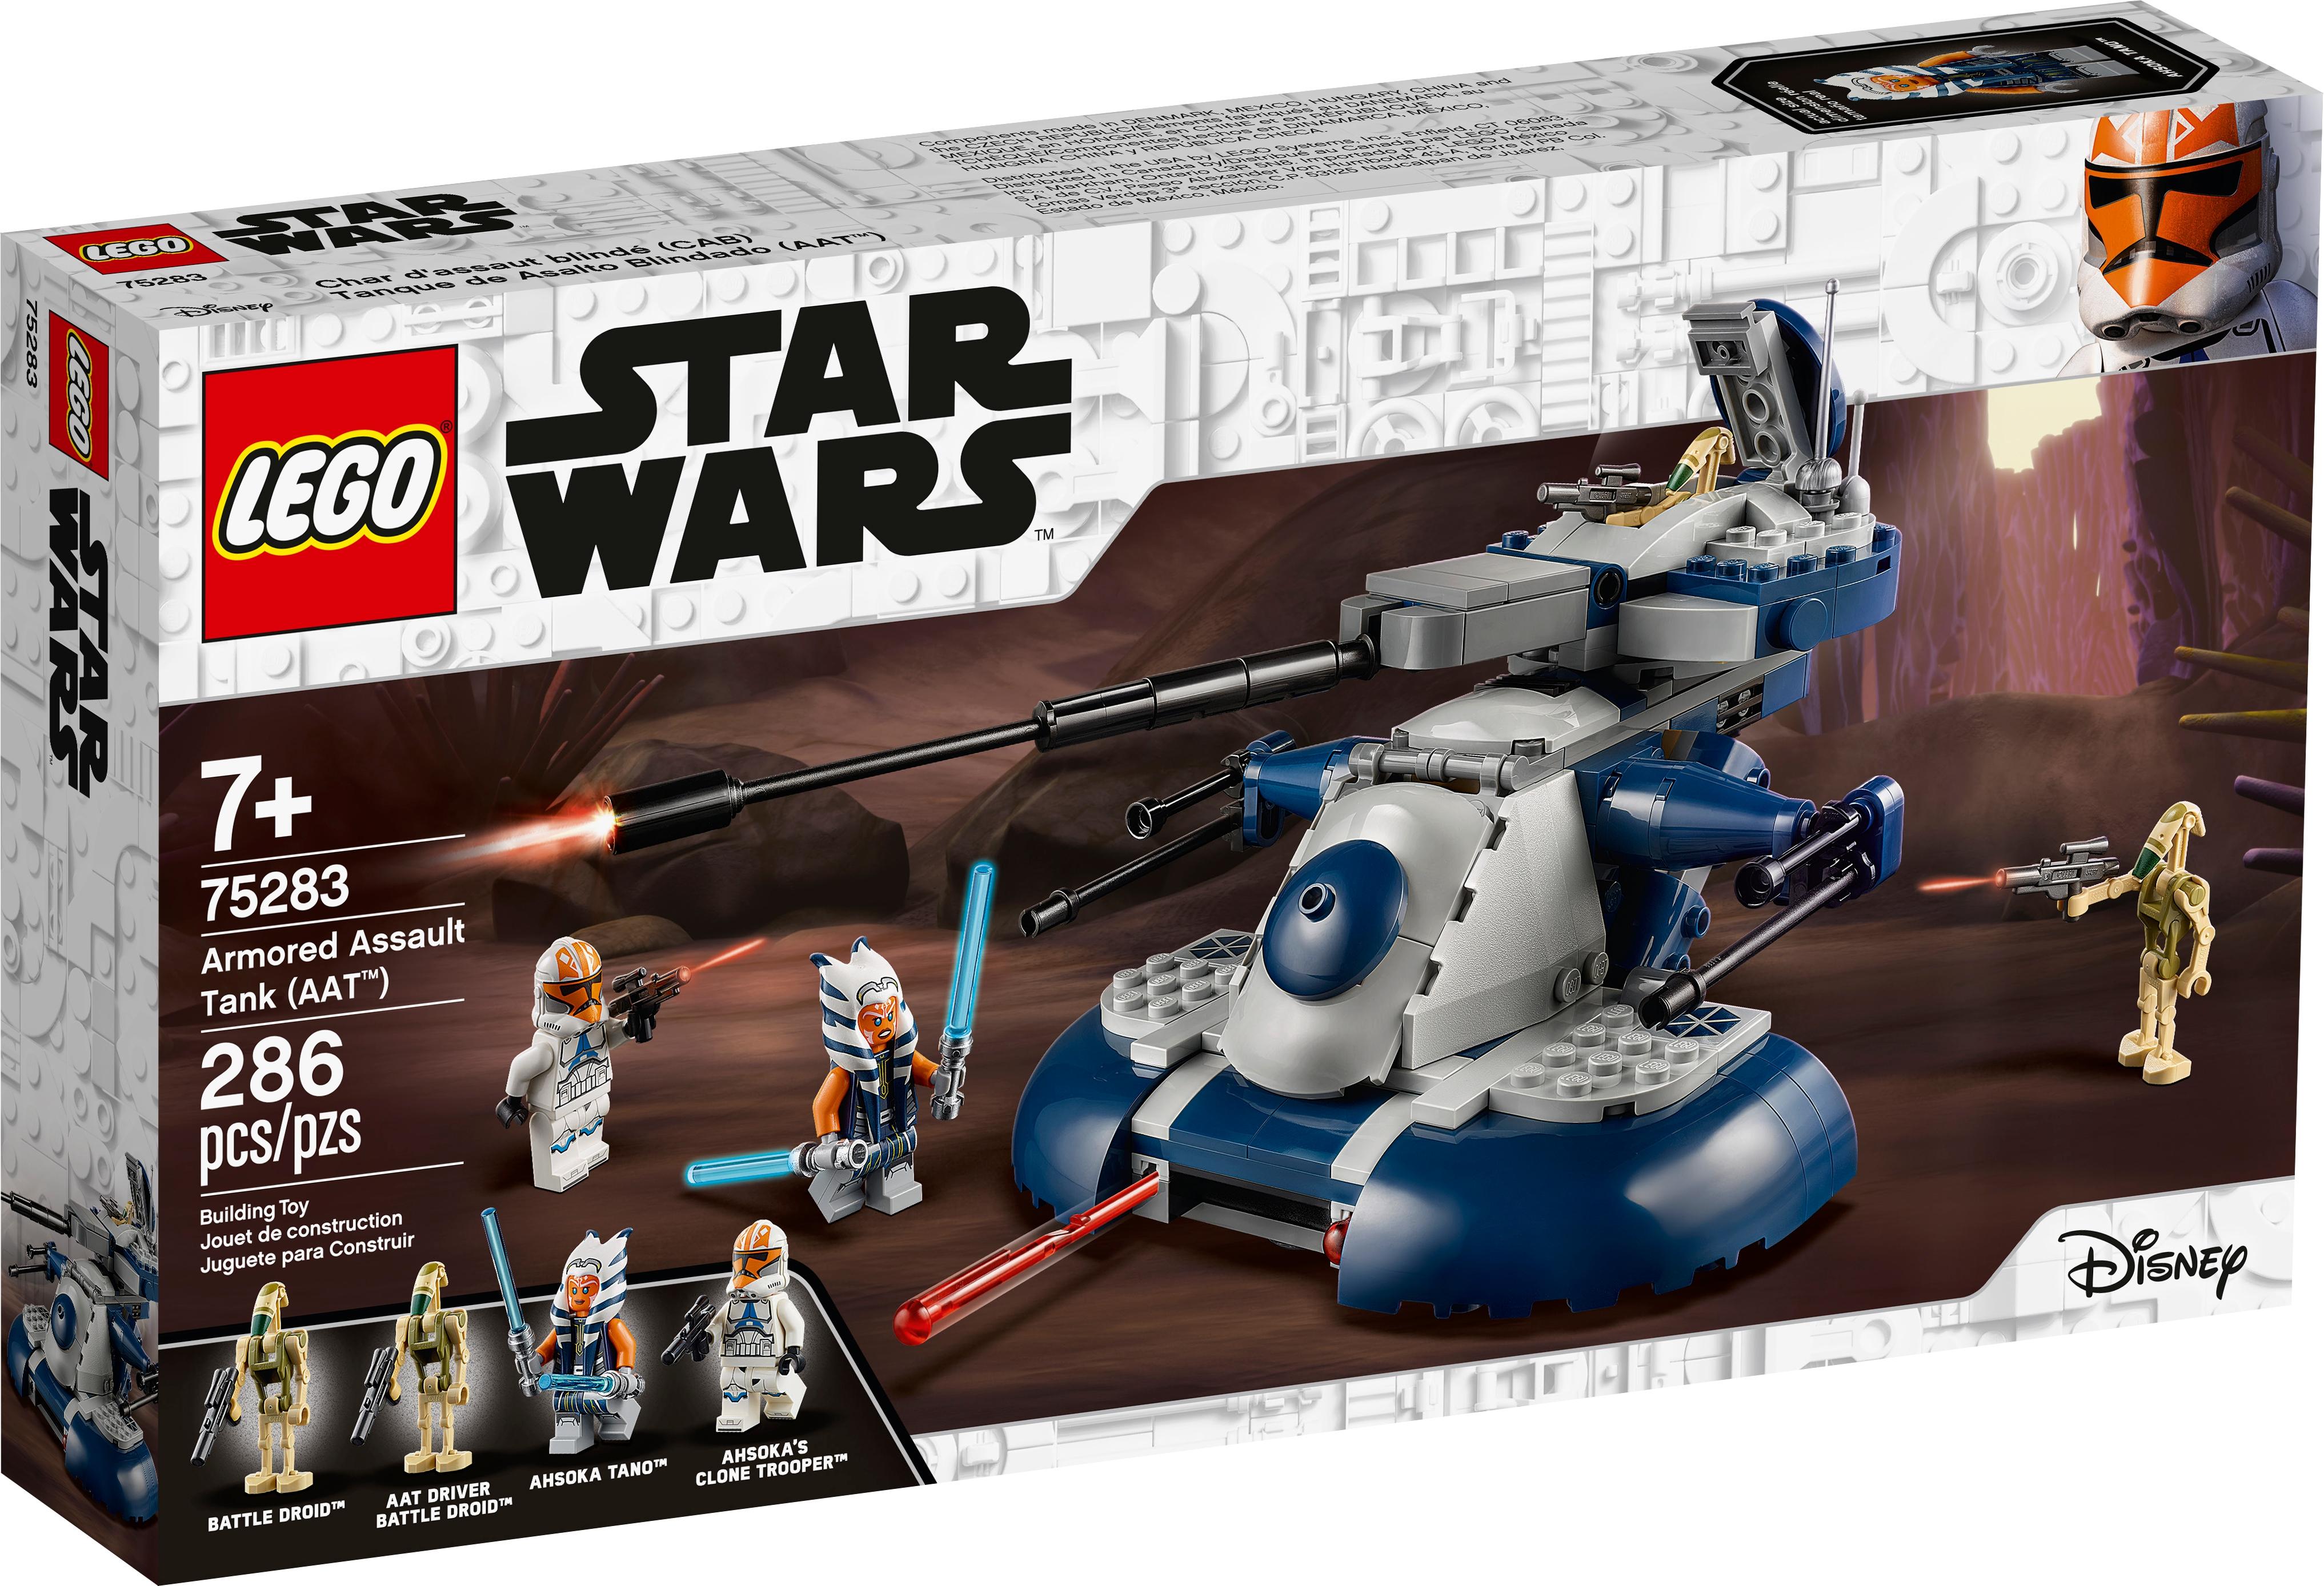 Lego Star Wars Clone Wars 75283 Armored Assault Tank AAT Vehicle ONLY BONUS